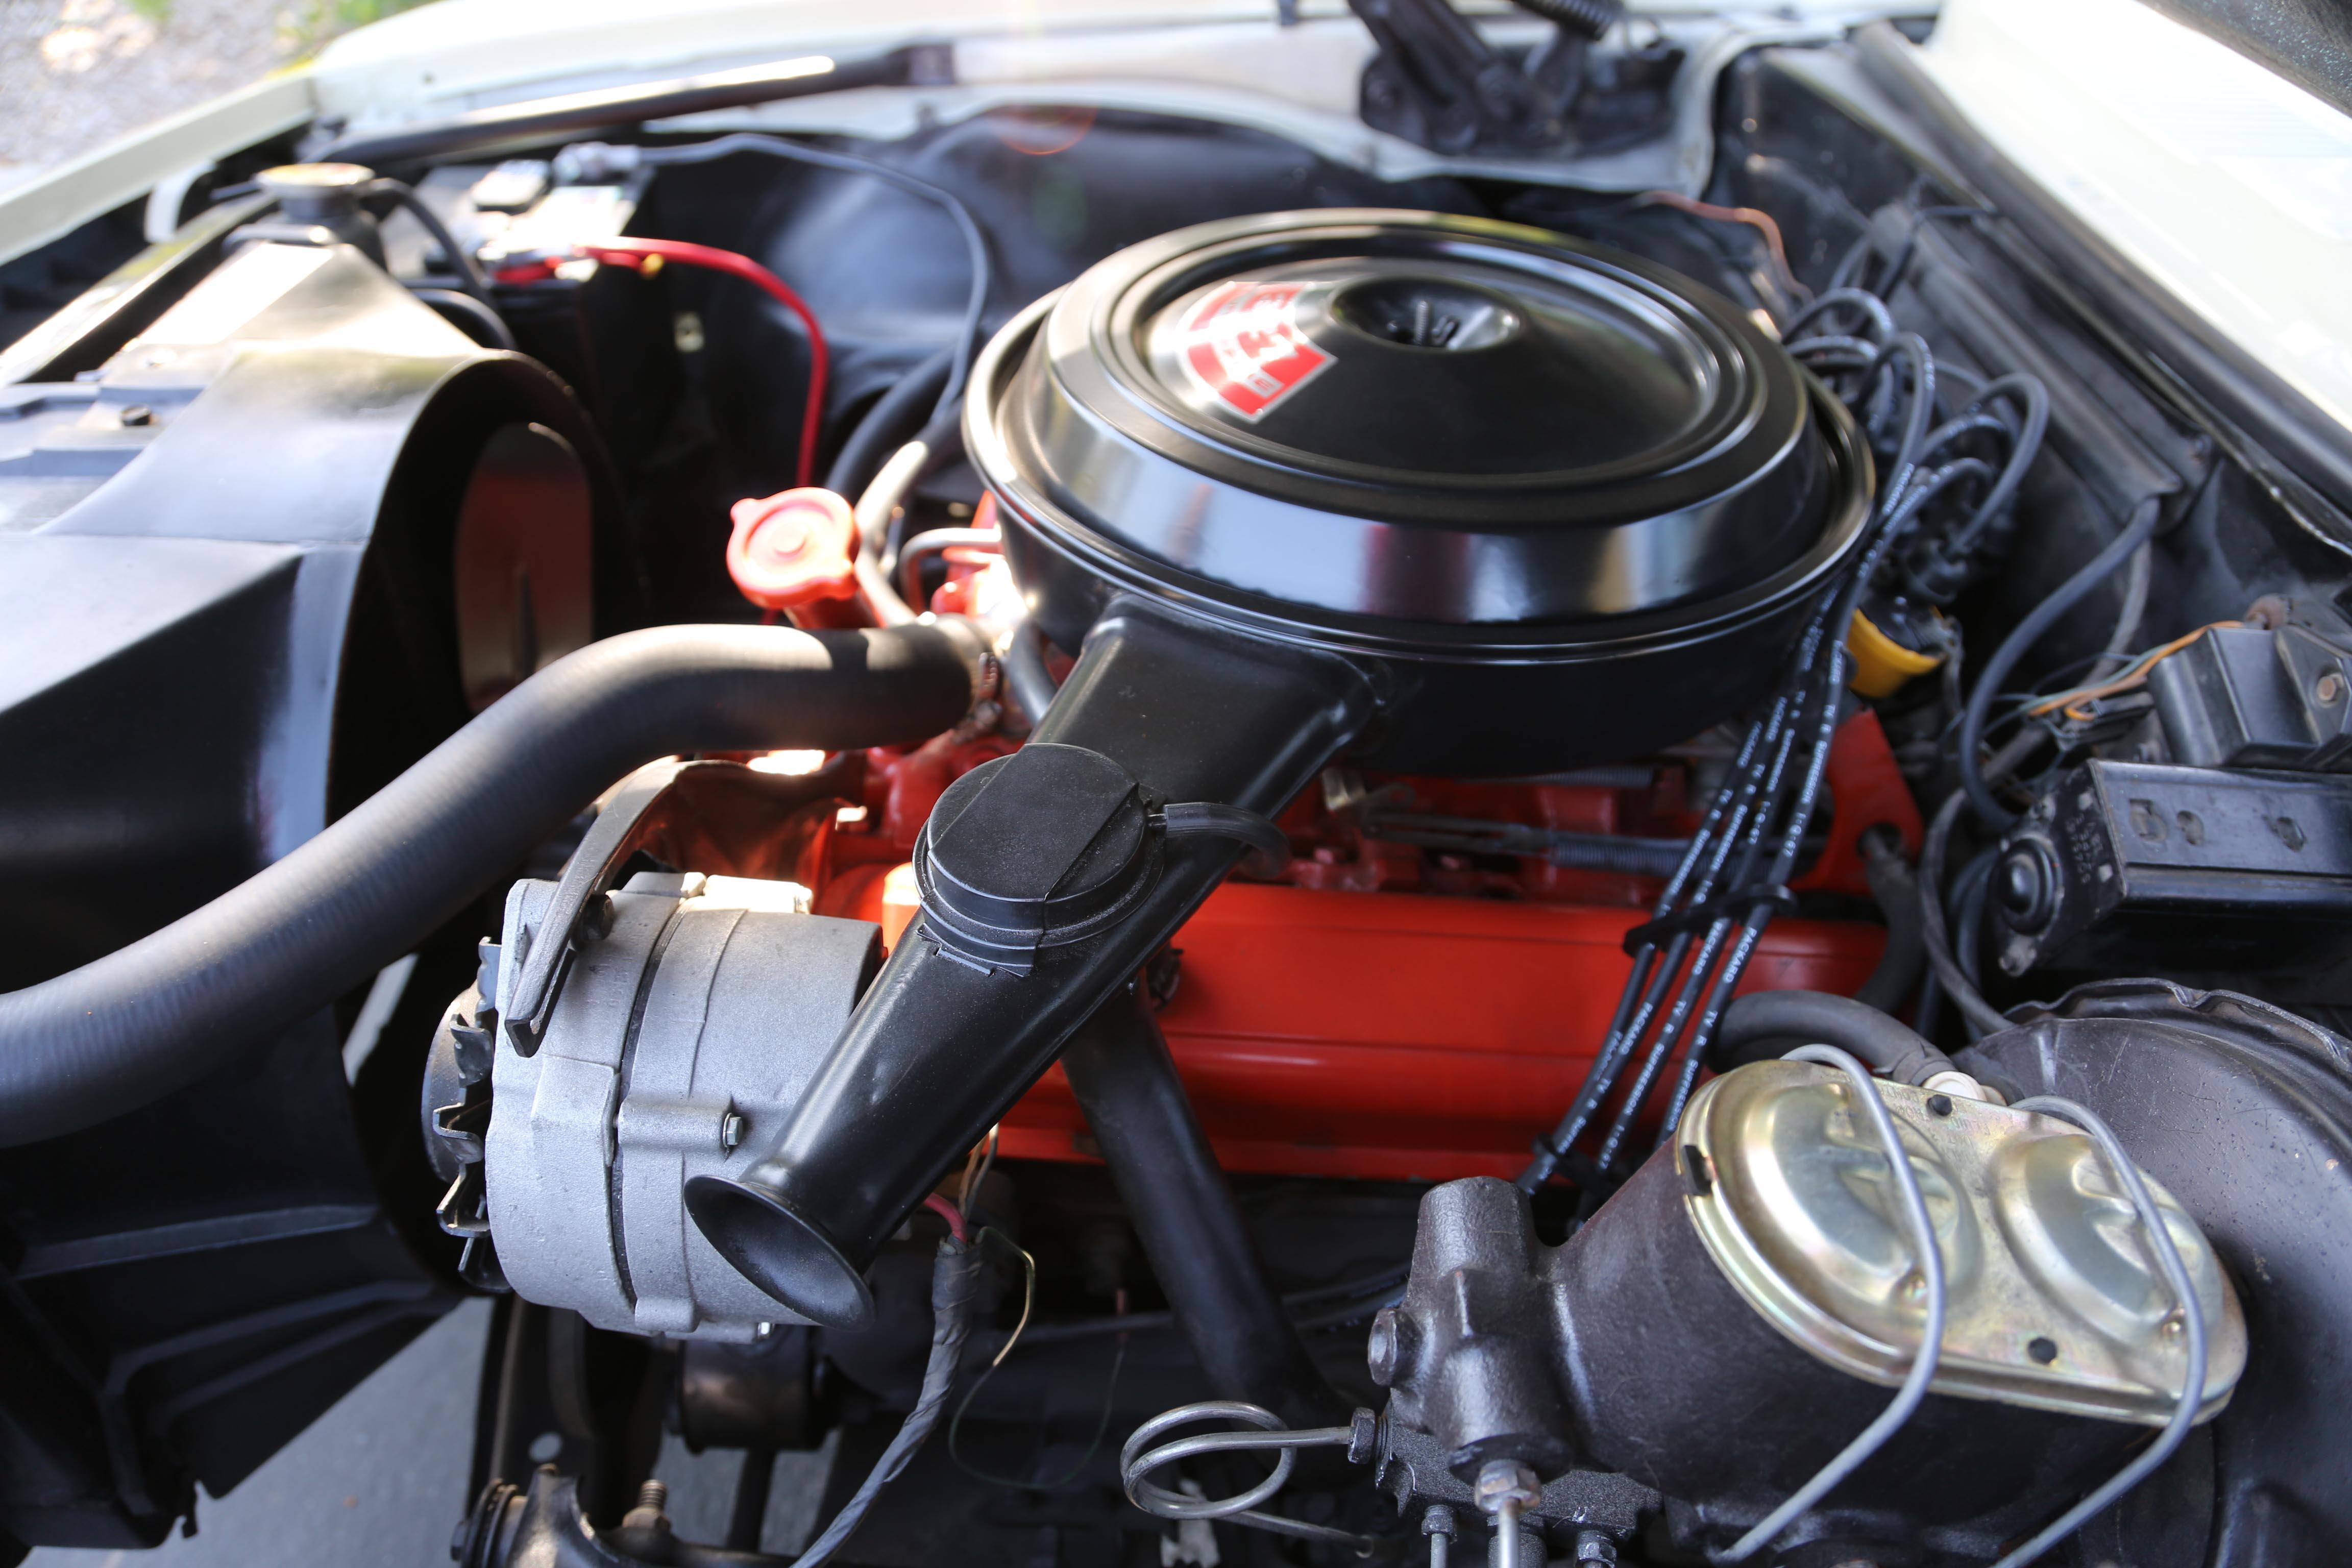 1968 Camaro Odd Options Engine drivers side